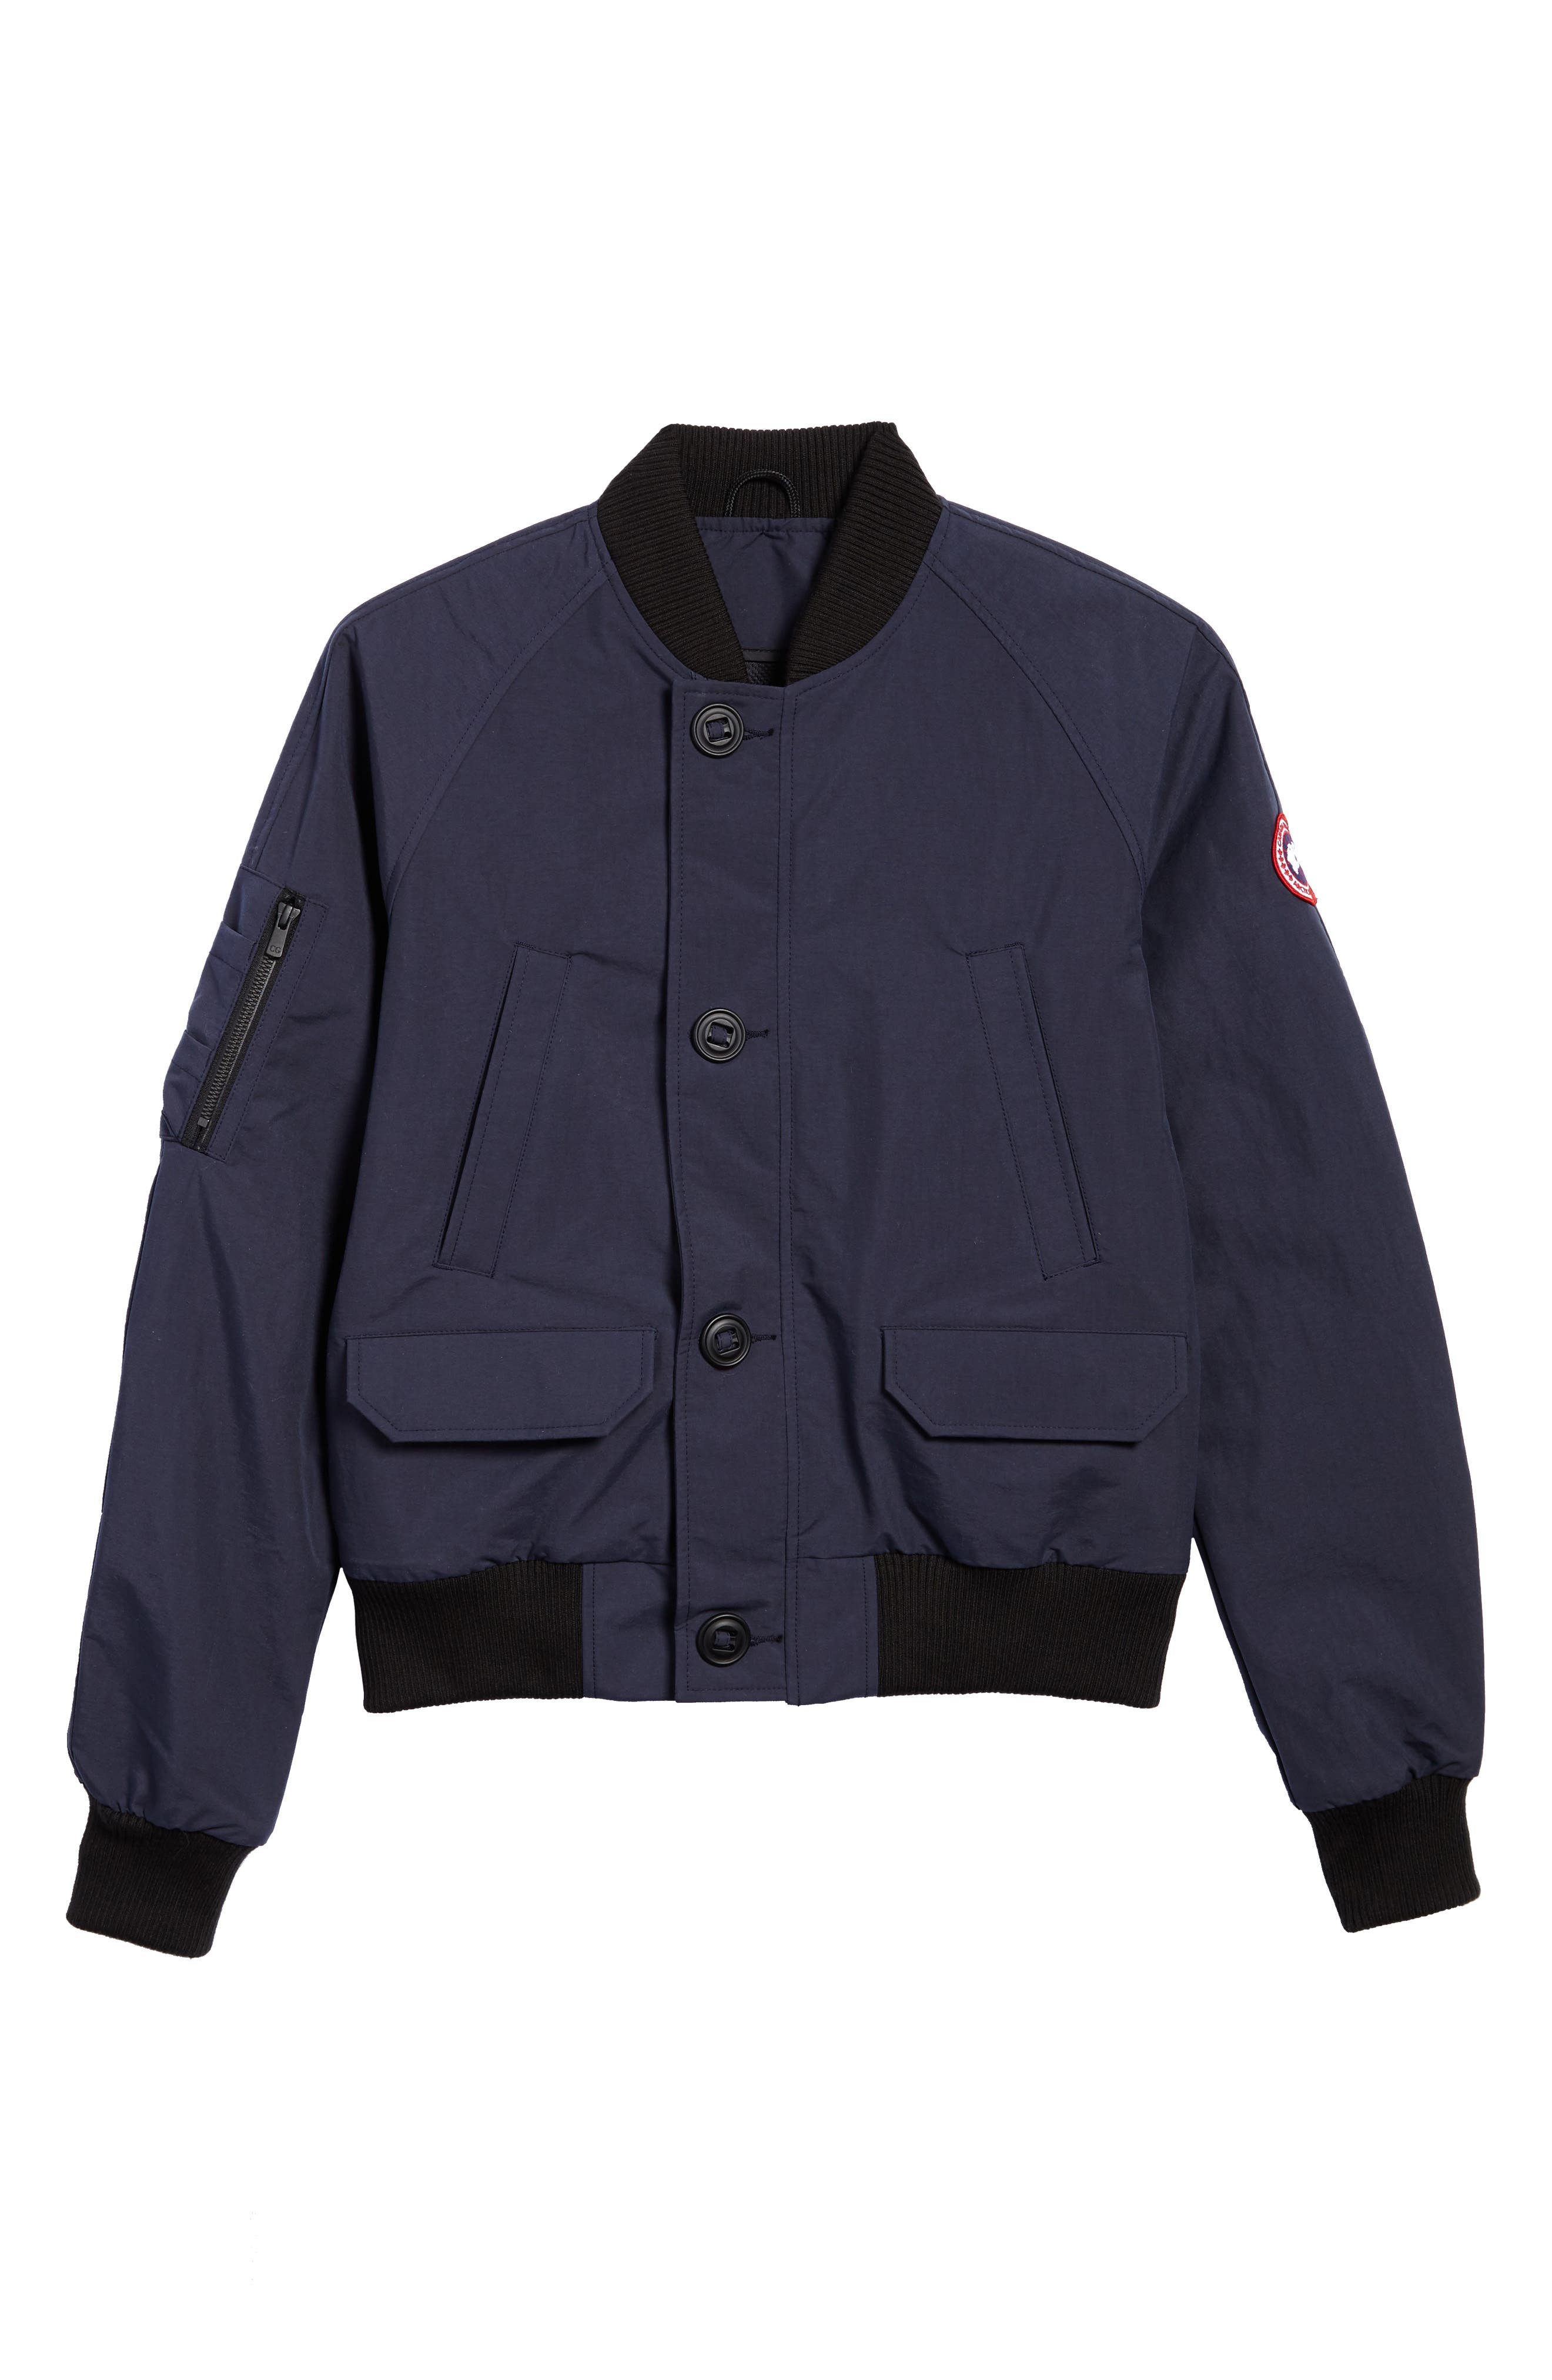 CANADA GOOSE, Faber Slim Fit Bomber Jacket, Alternate thumbnail 5, color, 400